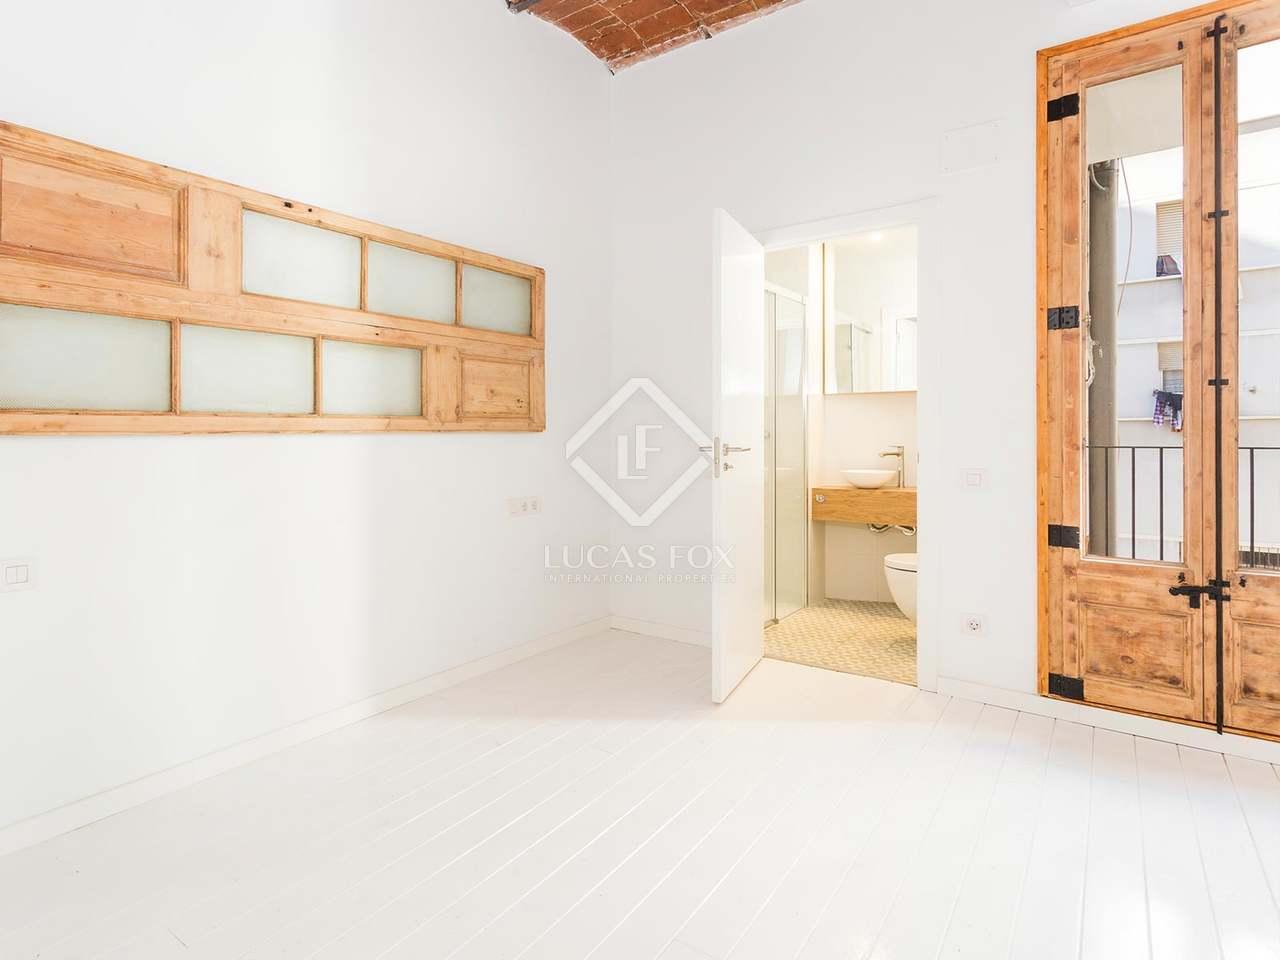 Apartamento de 55 m en venta en la barceloneta - Apartamentos en la barceloneta ...